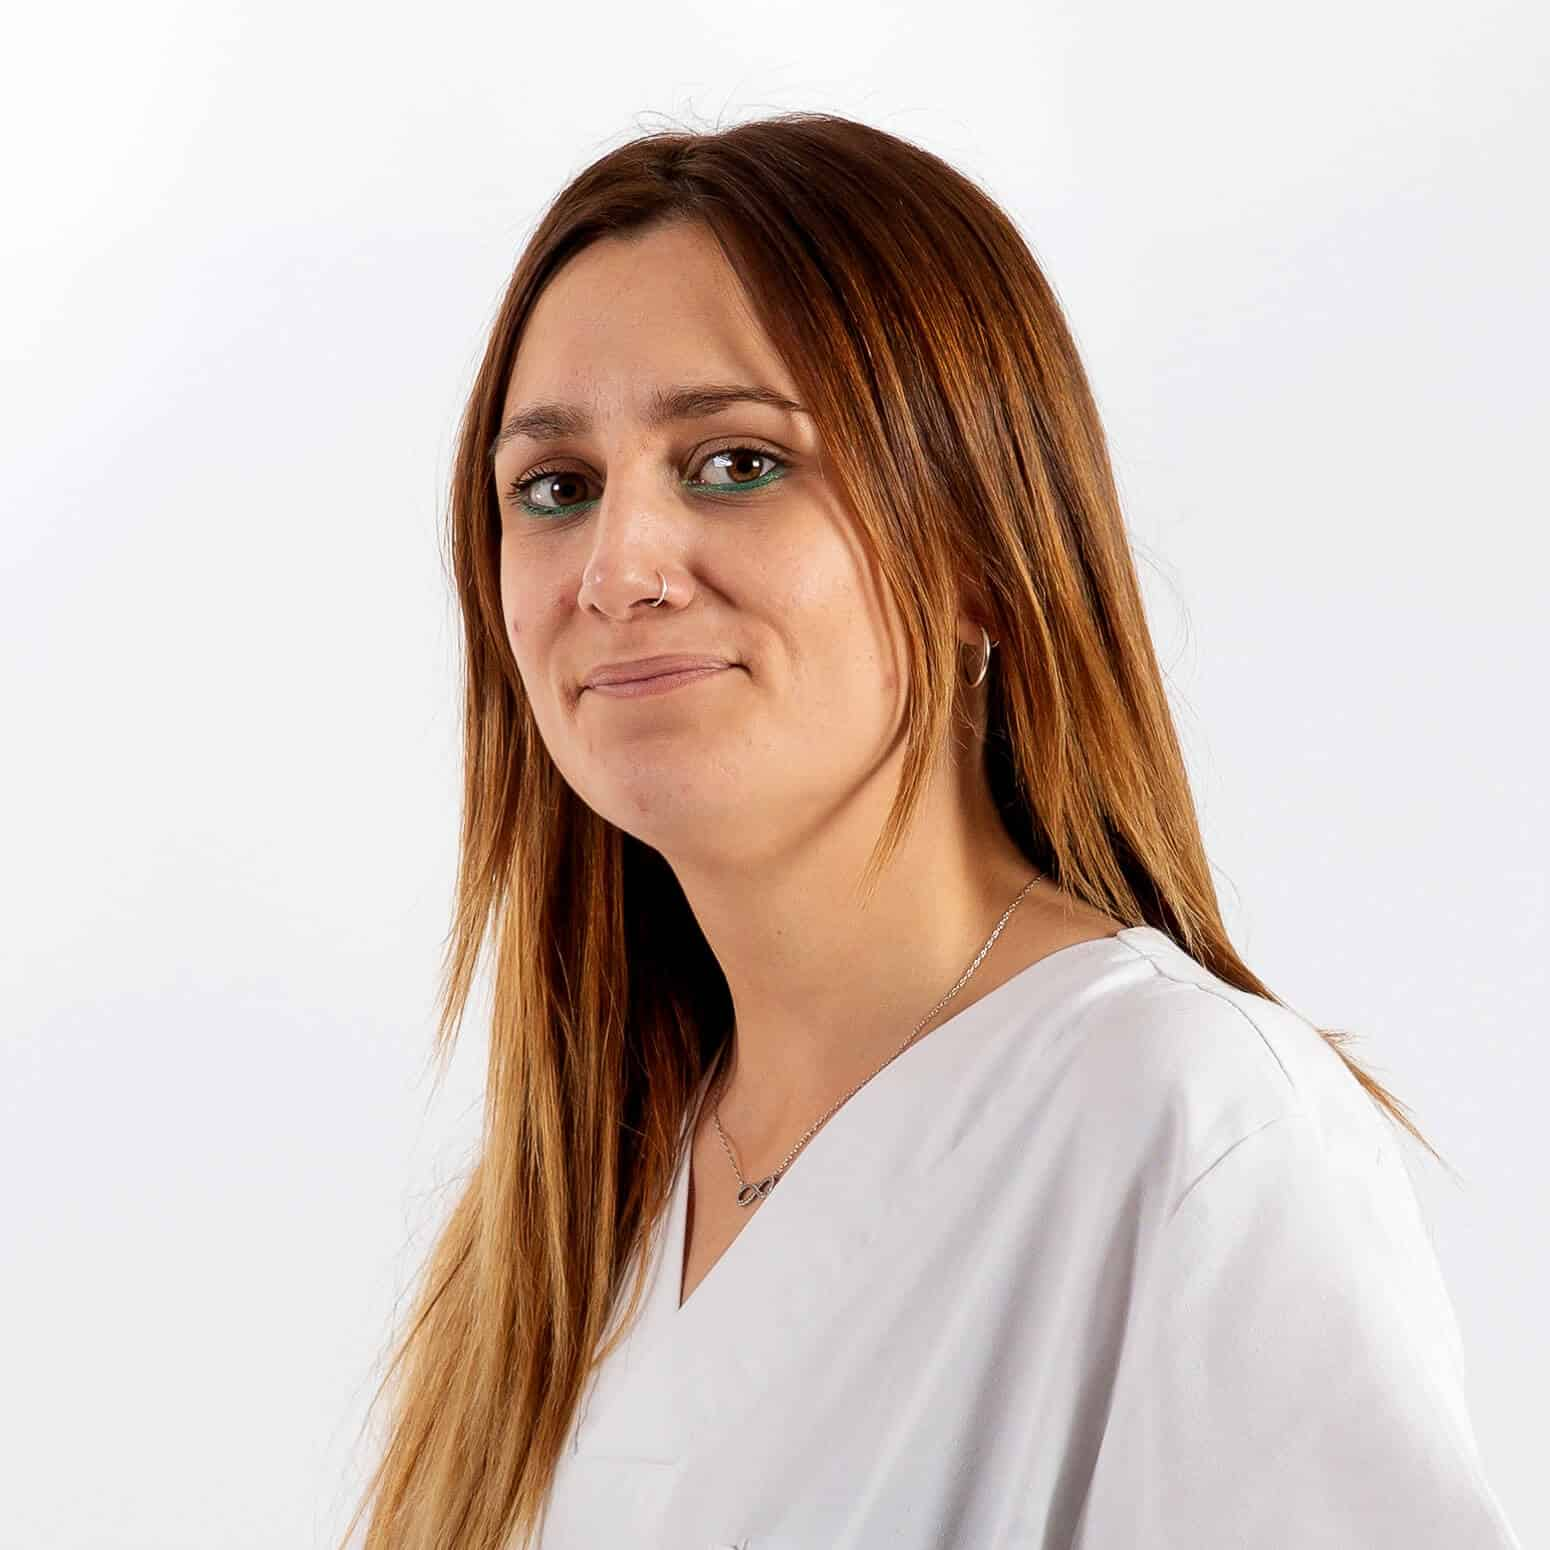 Ana Sánz Cañestro